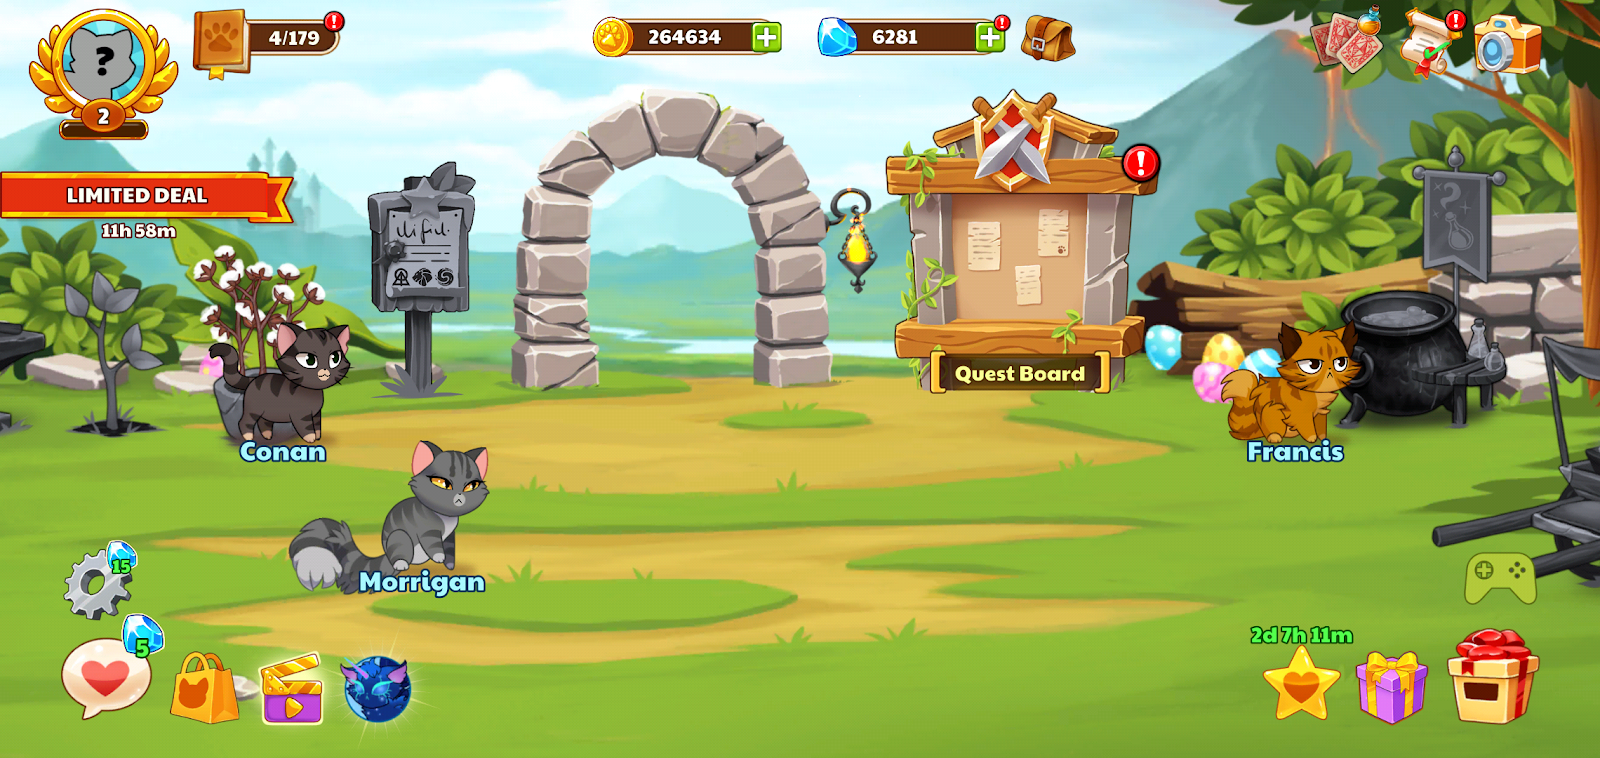 Castle Cats Mod Apk Version 2 5 24 Free Shopping - Technical